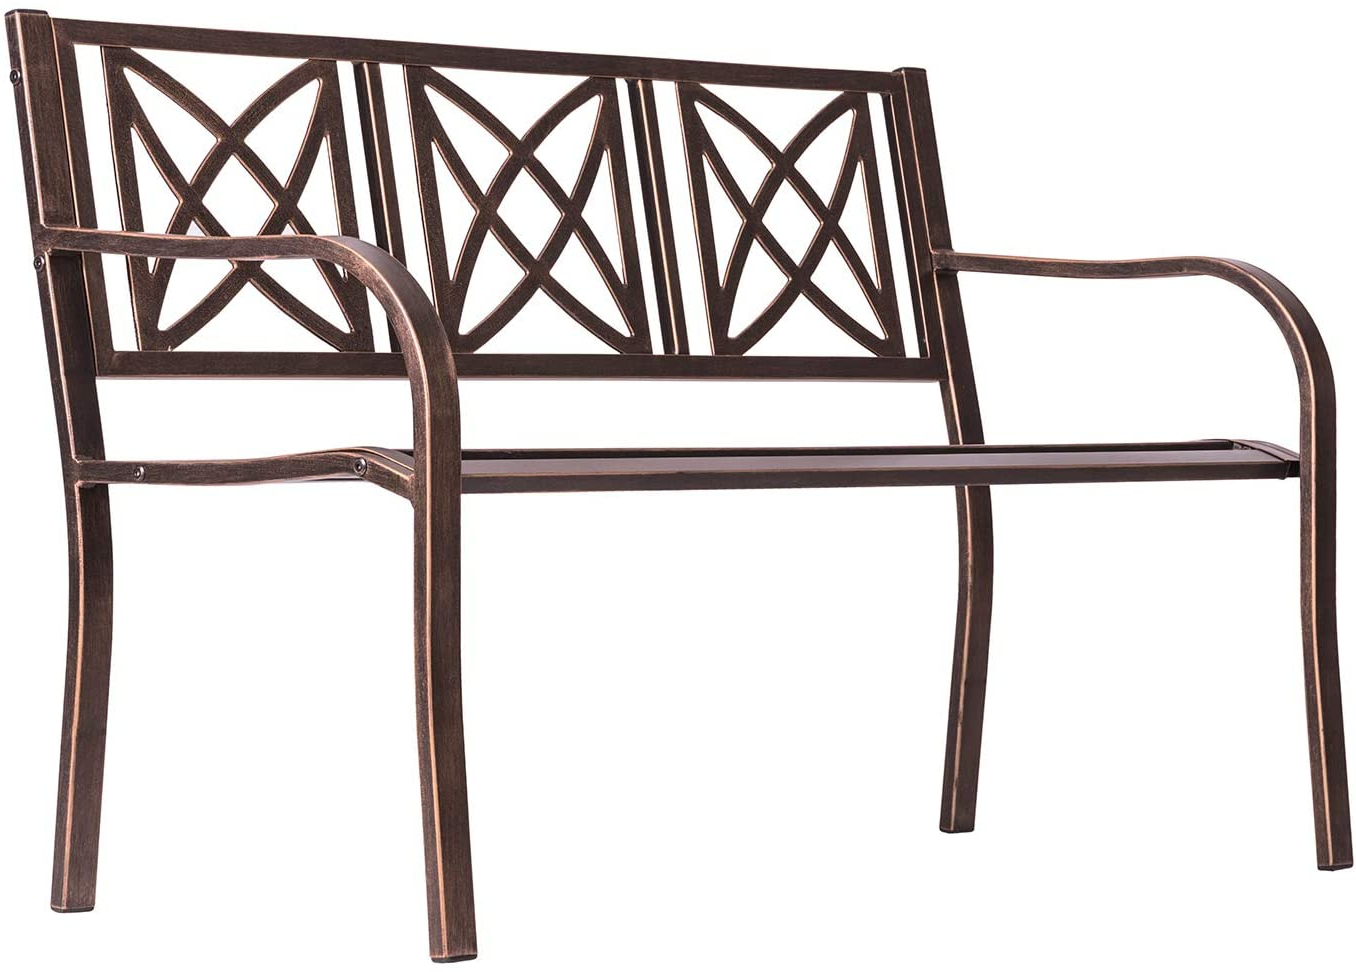 Vifah Paracelsus 4 Foot Metal Garden Bench (bronze): Amazon Throughout 2020 Blooming Iron Garden Benches (View 25 of 30)